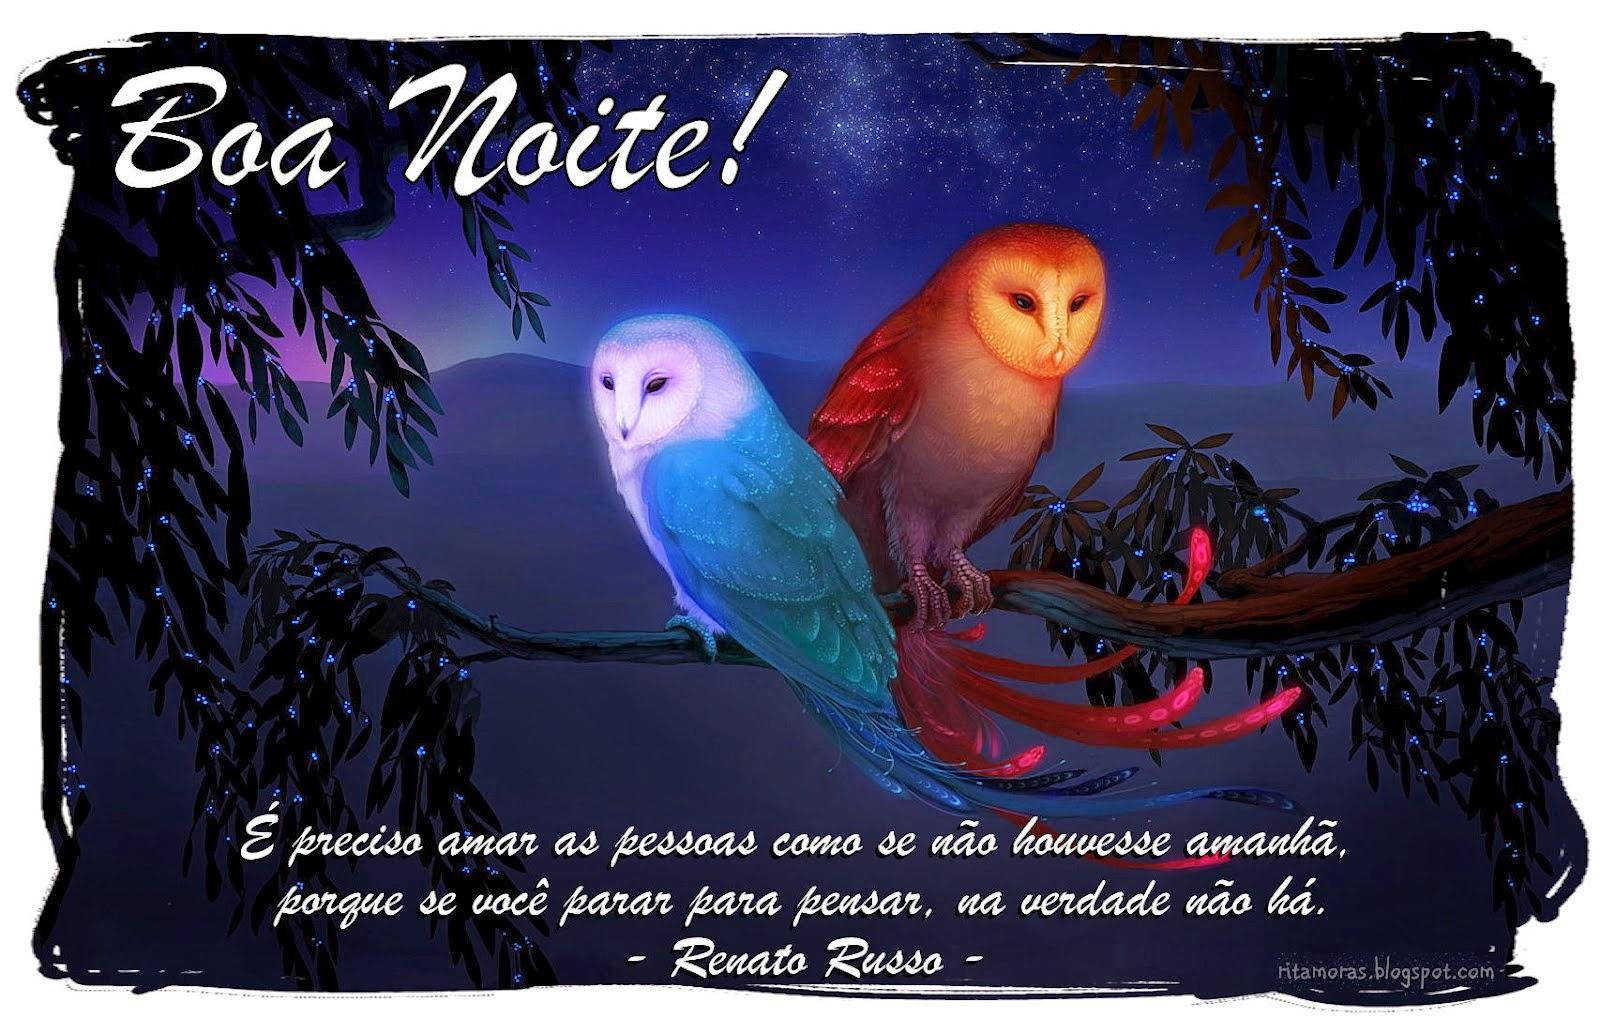 24 Best Images About Boa Noite On Pinterest: Violetta Brasil: Abril 2014